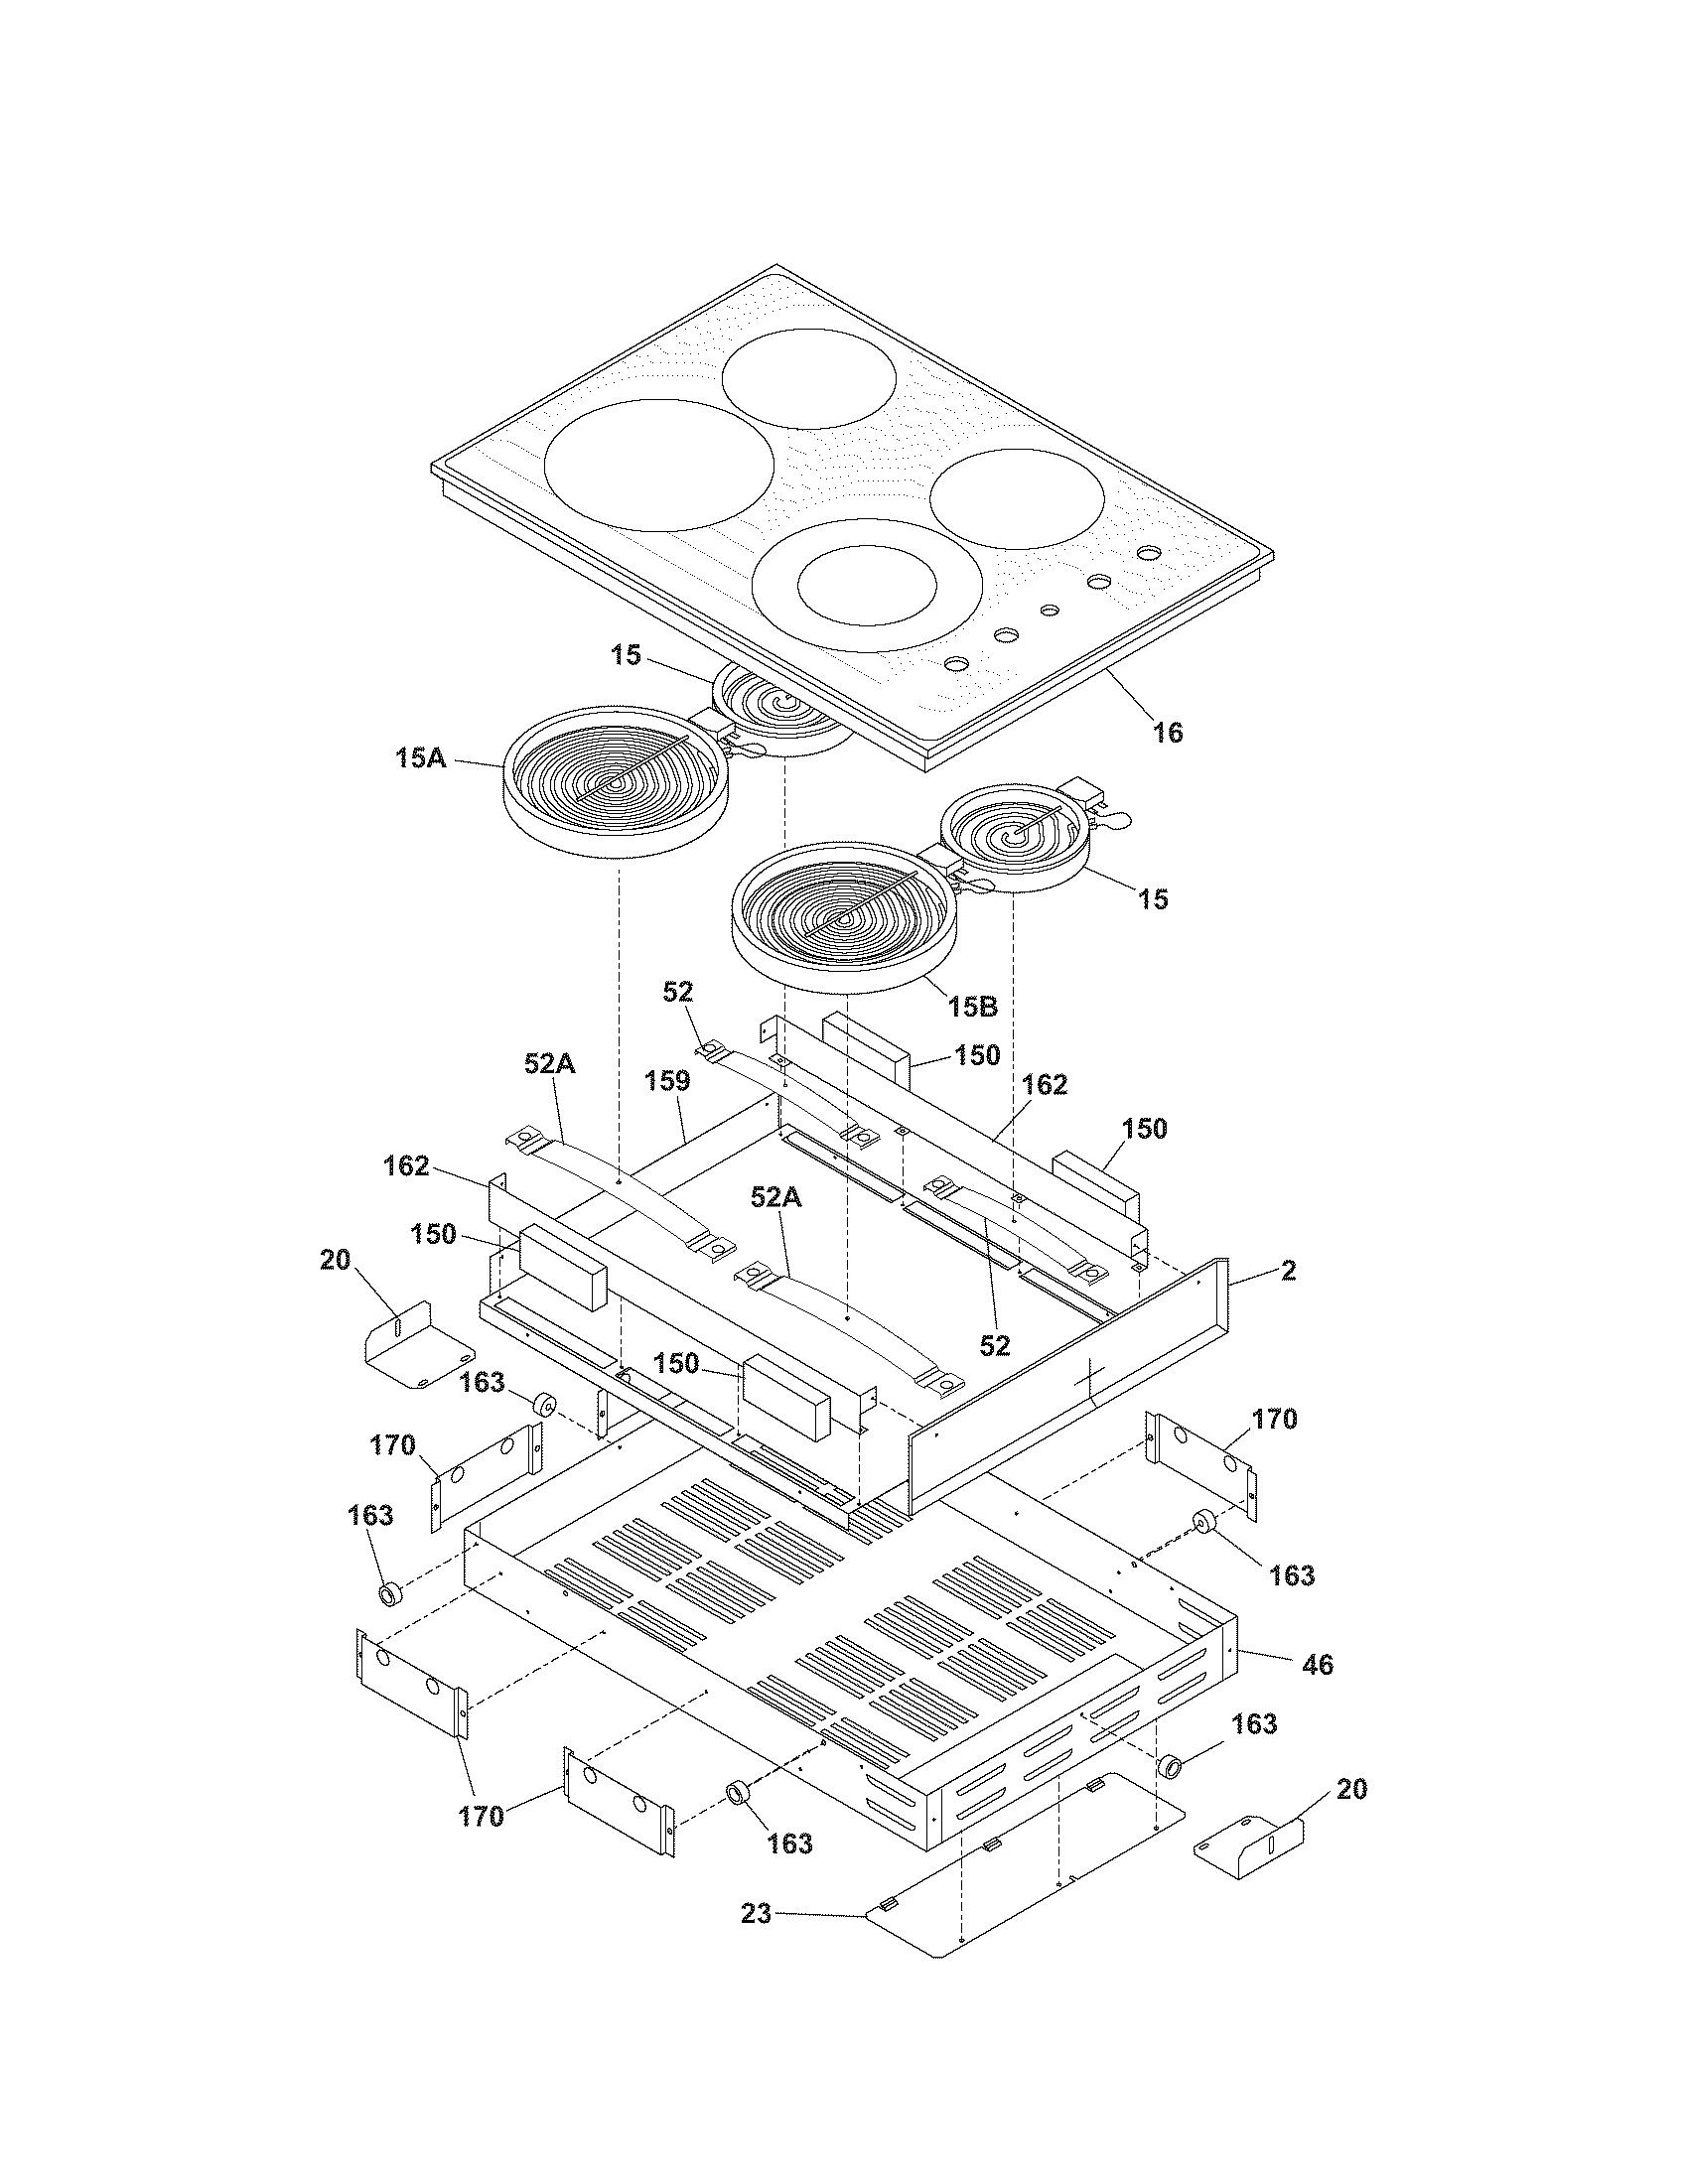 maintop diagram  u0026 parts list for model 79042739401 kenmore